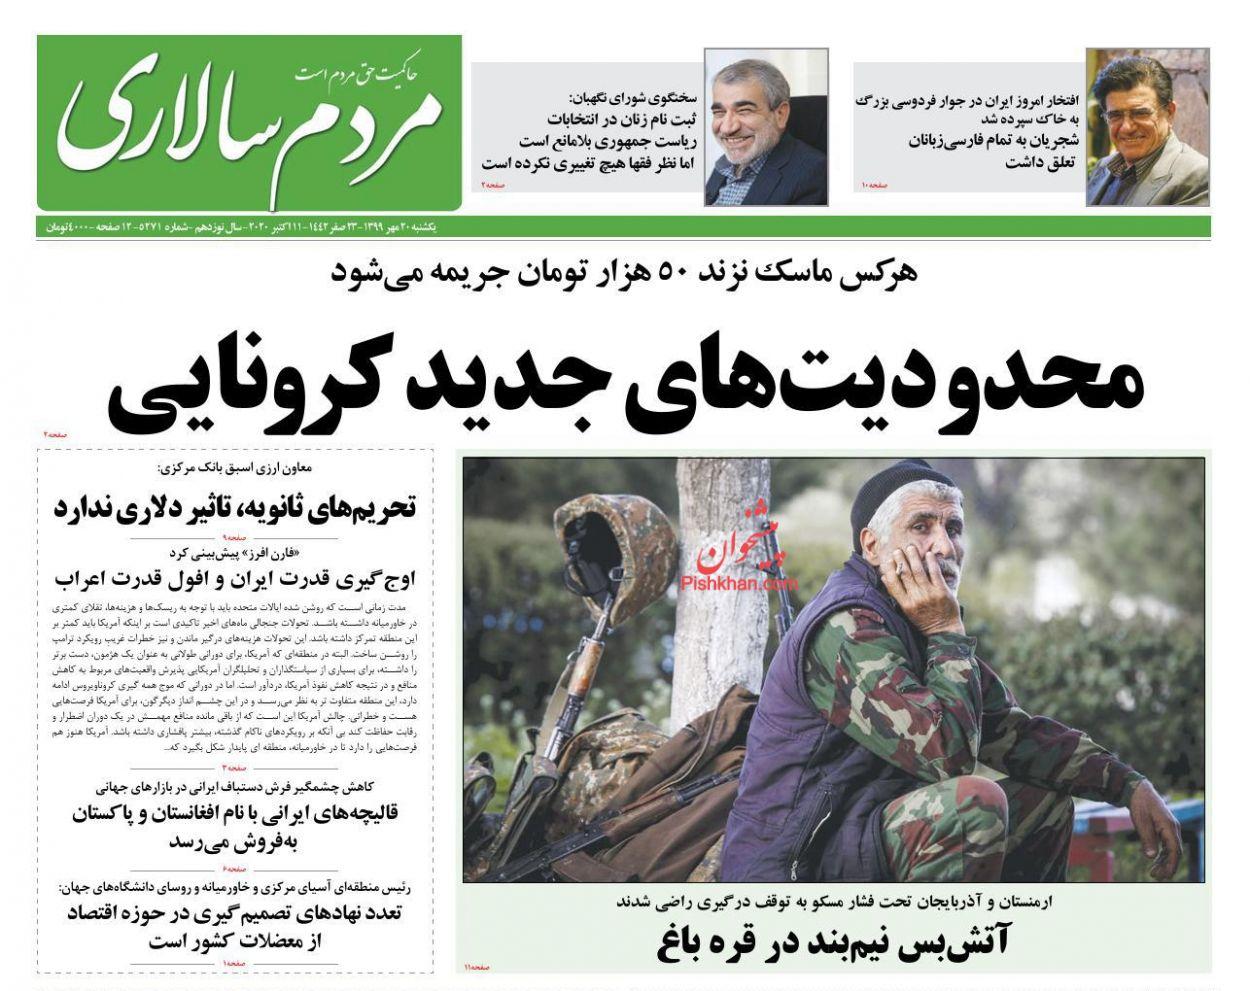 News headlines of Democracy newspaper on Sunday, October 11th